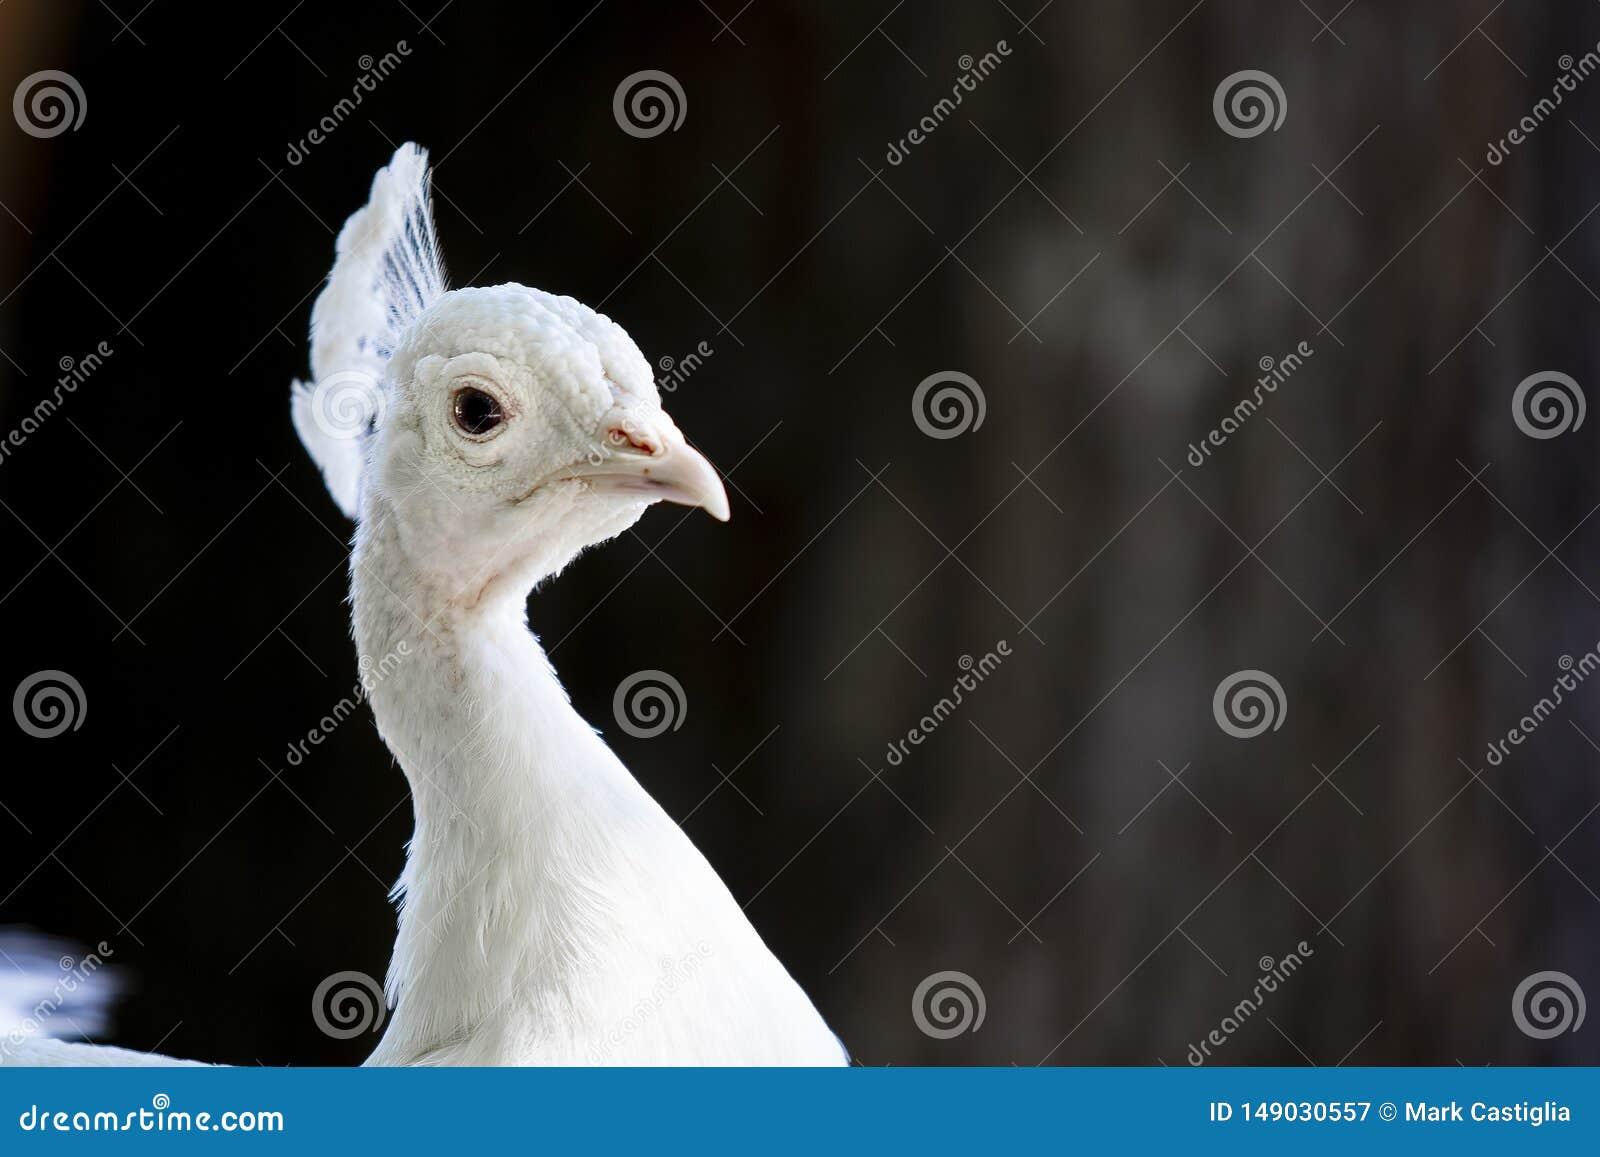 Albino peacock closeup with eye facing viewer.